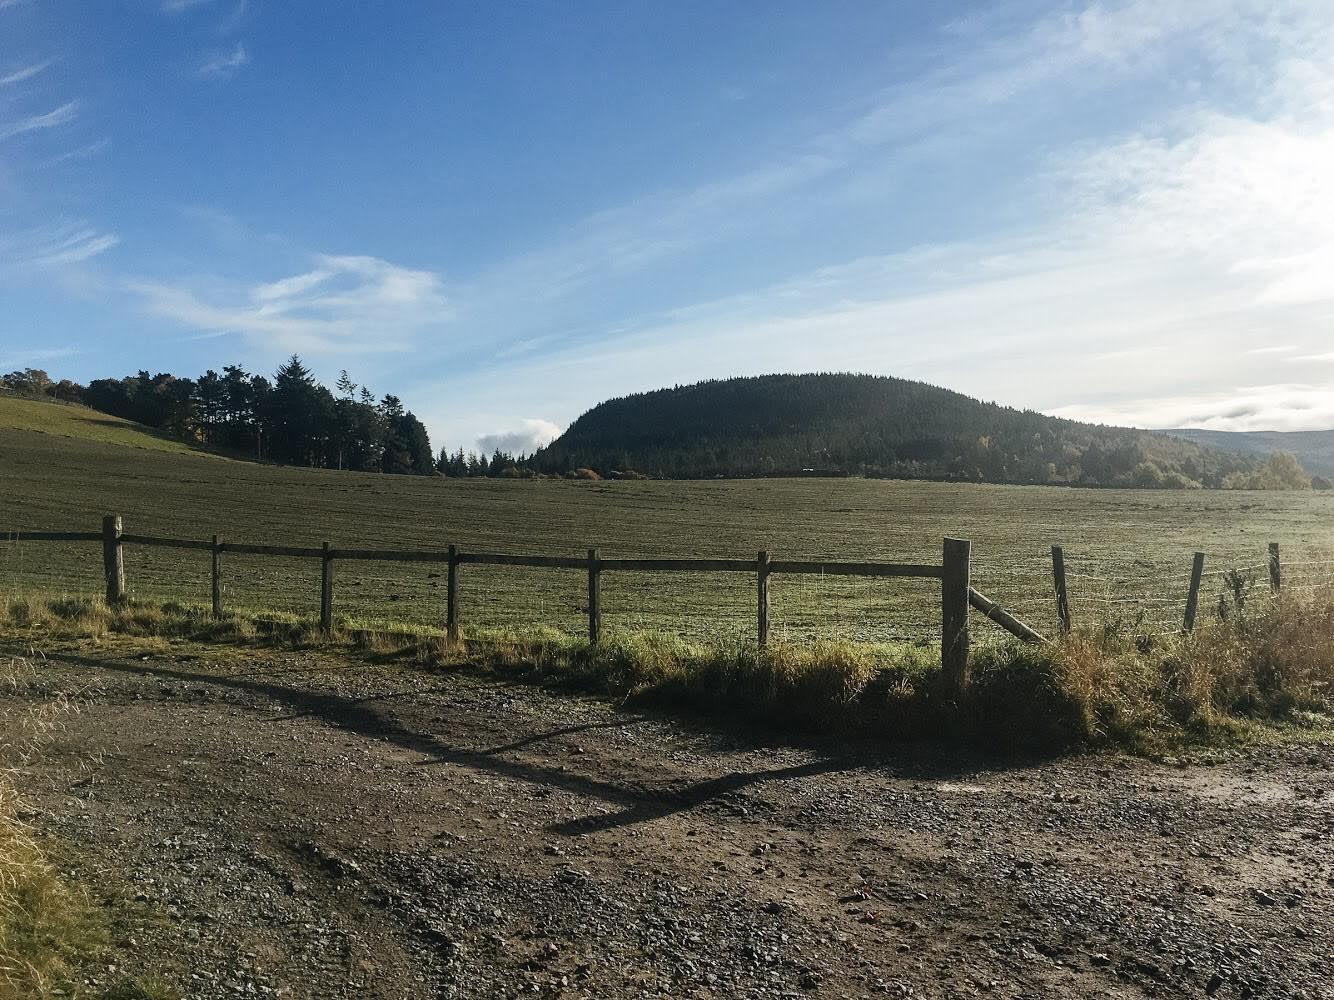 Showing Sgor Buidhe walk, Ballater, Cairngorms National Park